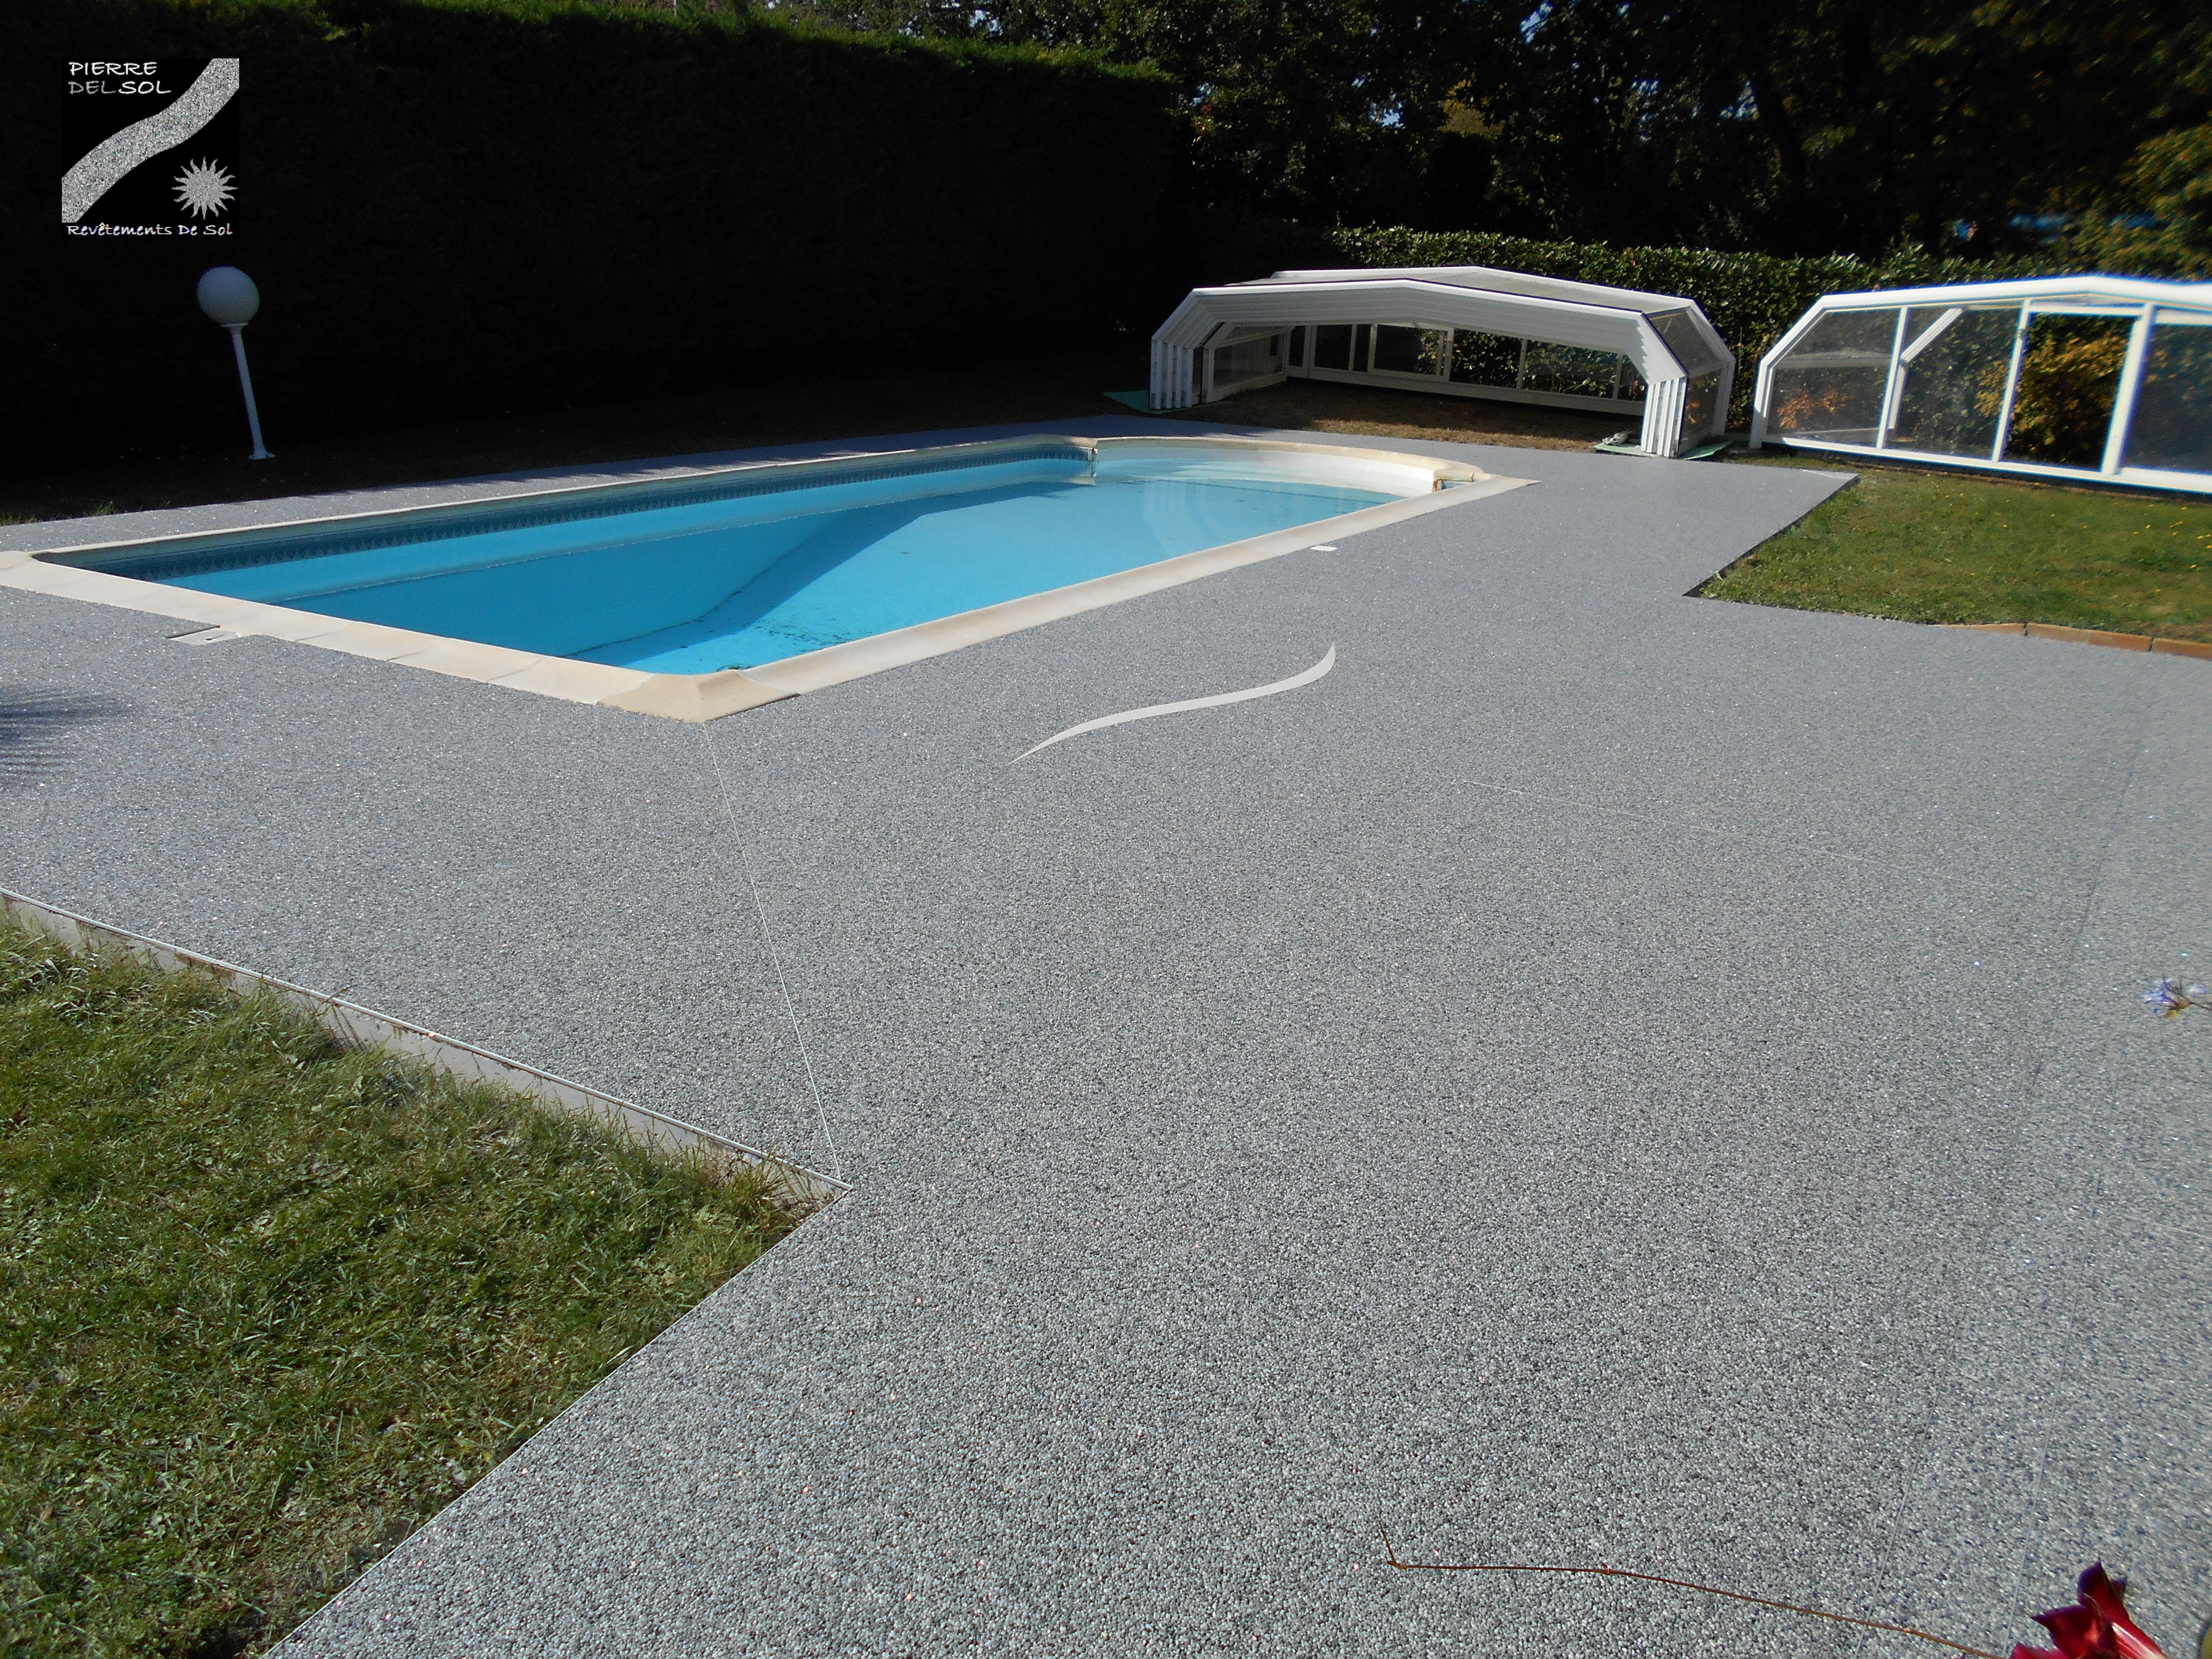 Plage de piscine à Boulazac (24)